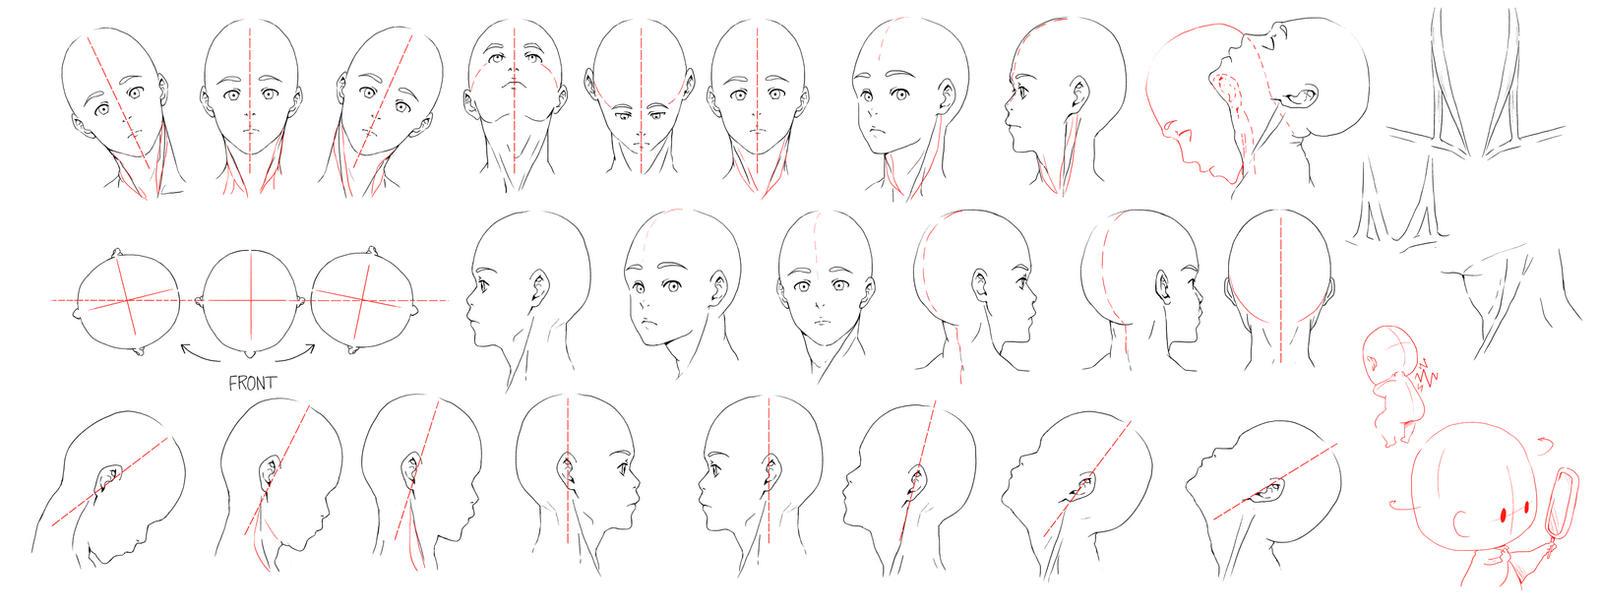 Neckline Drawing : Resources head neck by deejuusan on deviantart